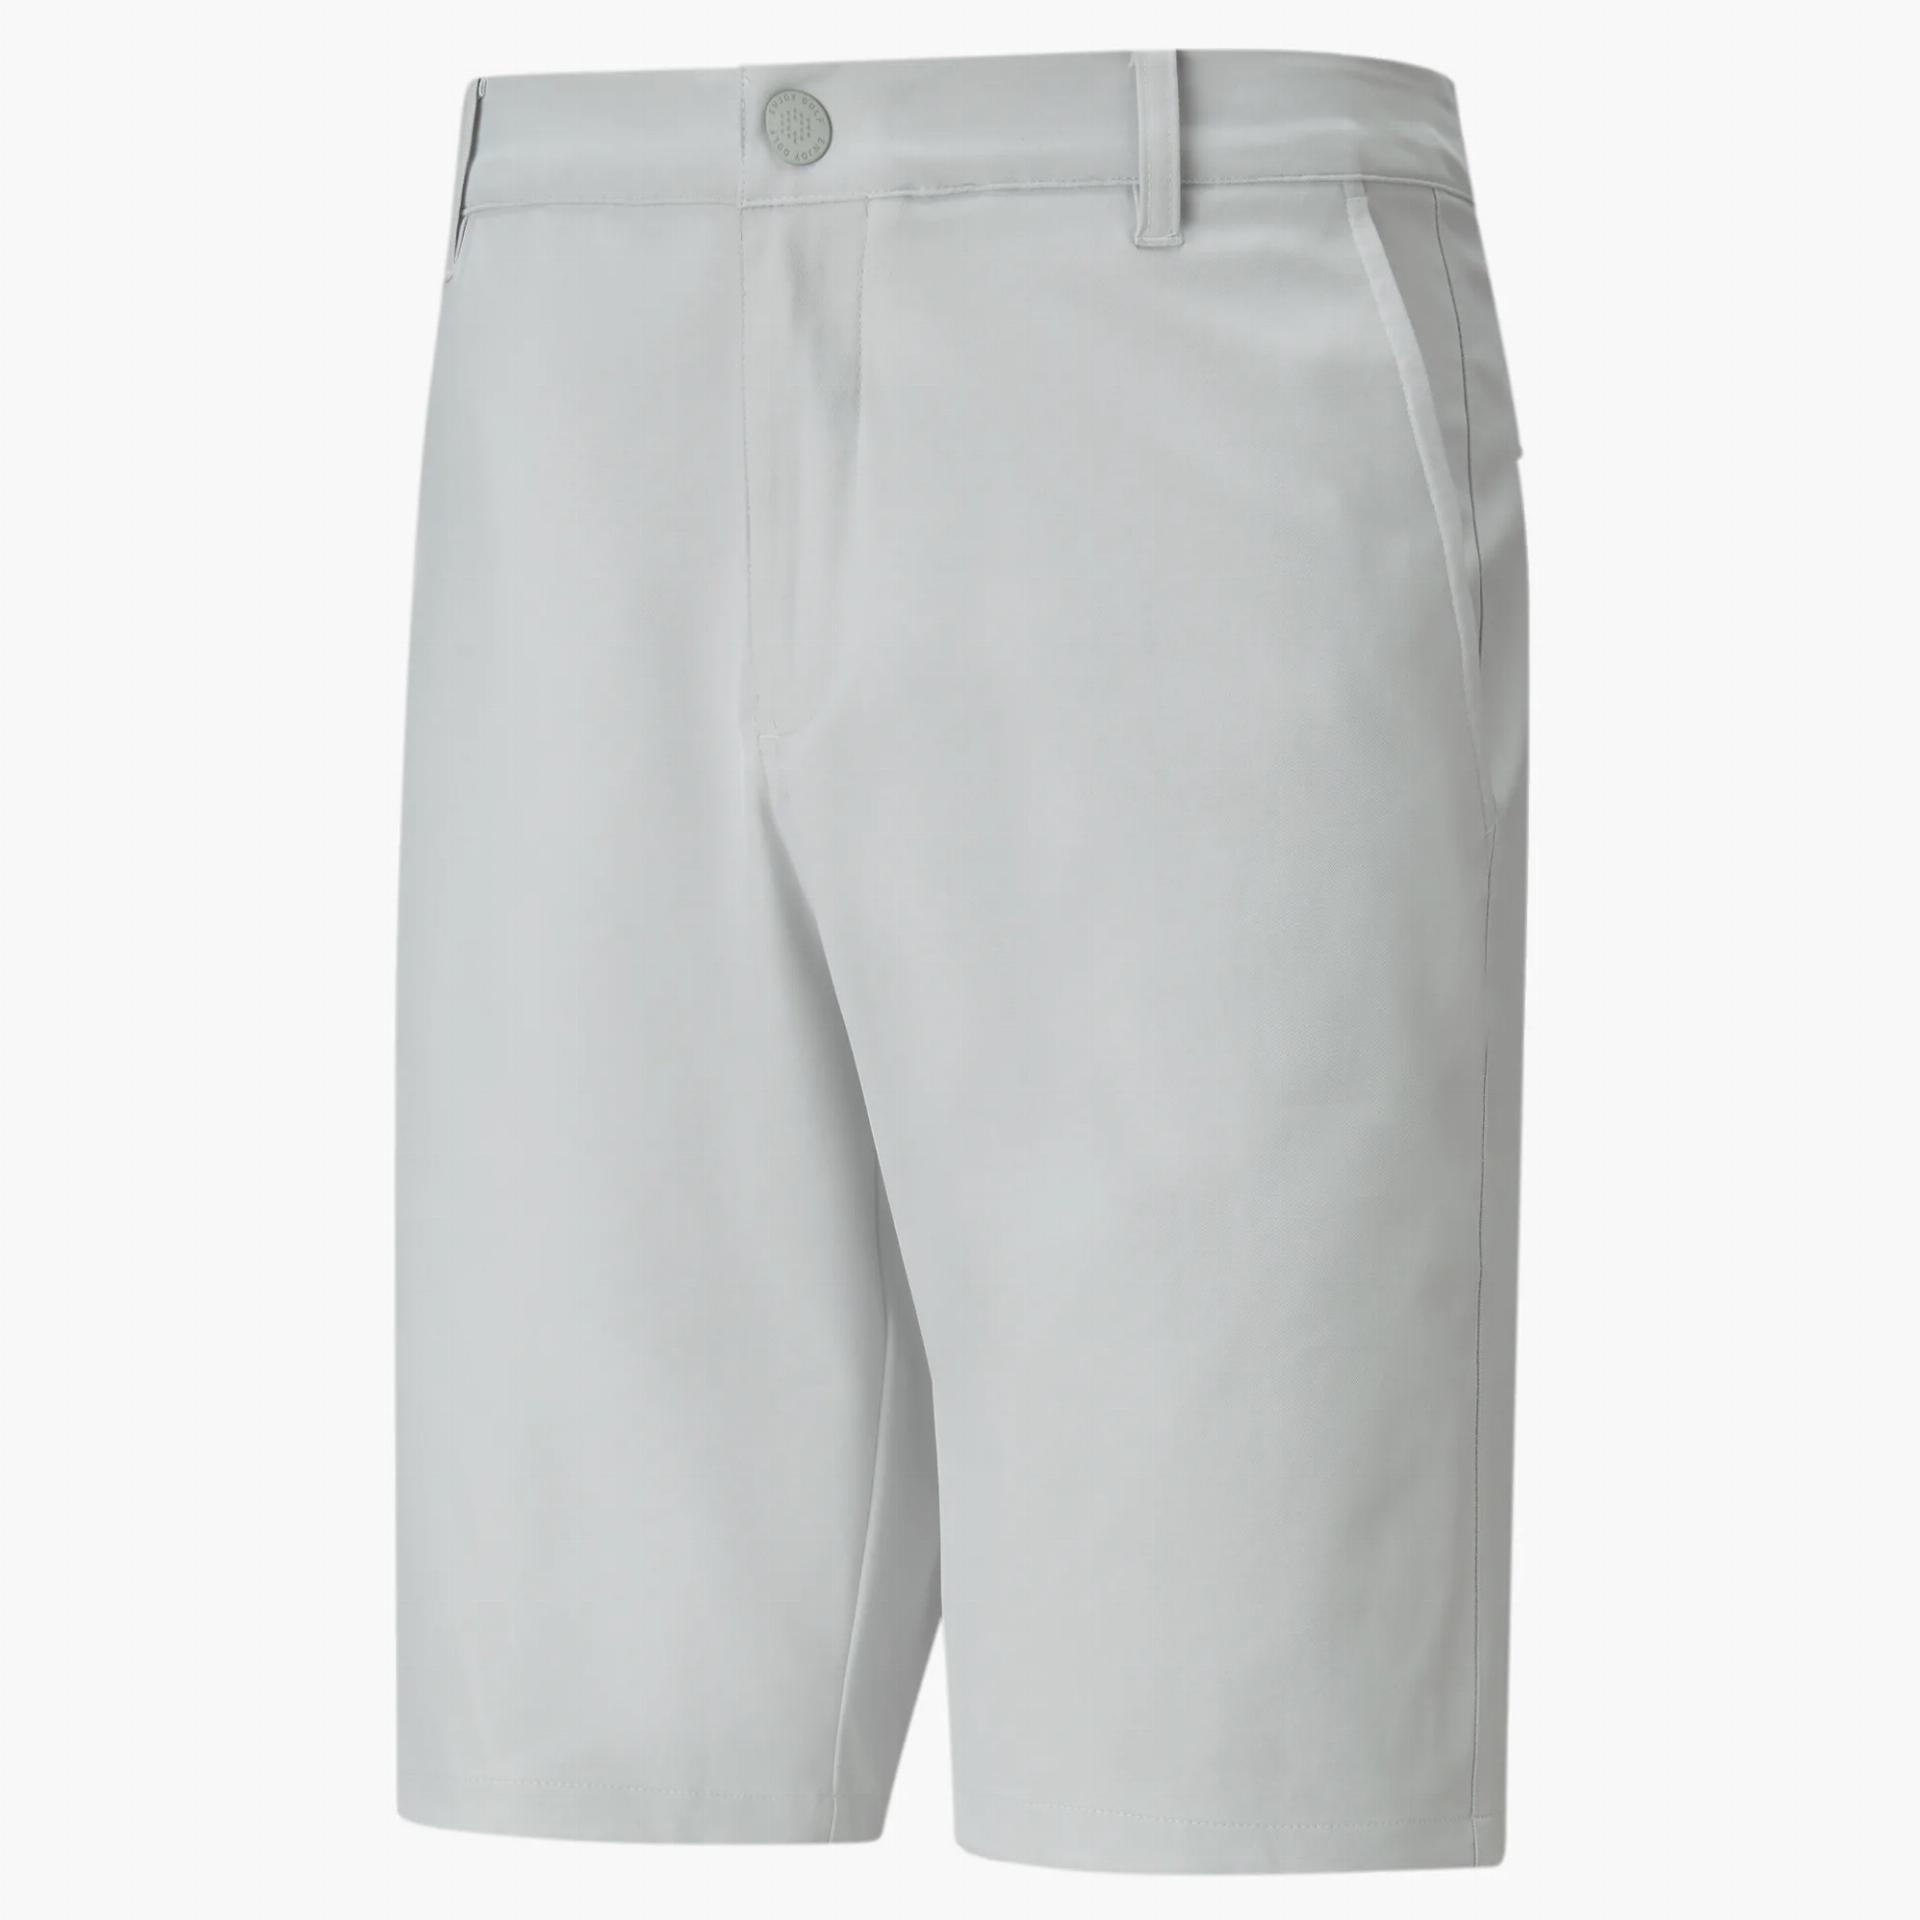 Jackpot Short, grey